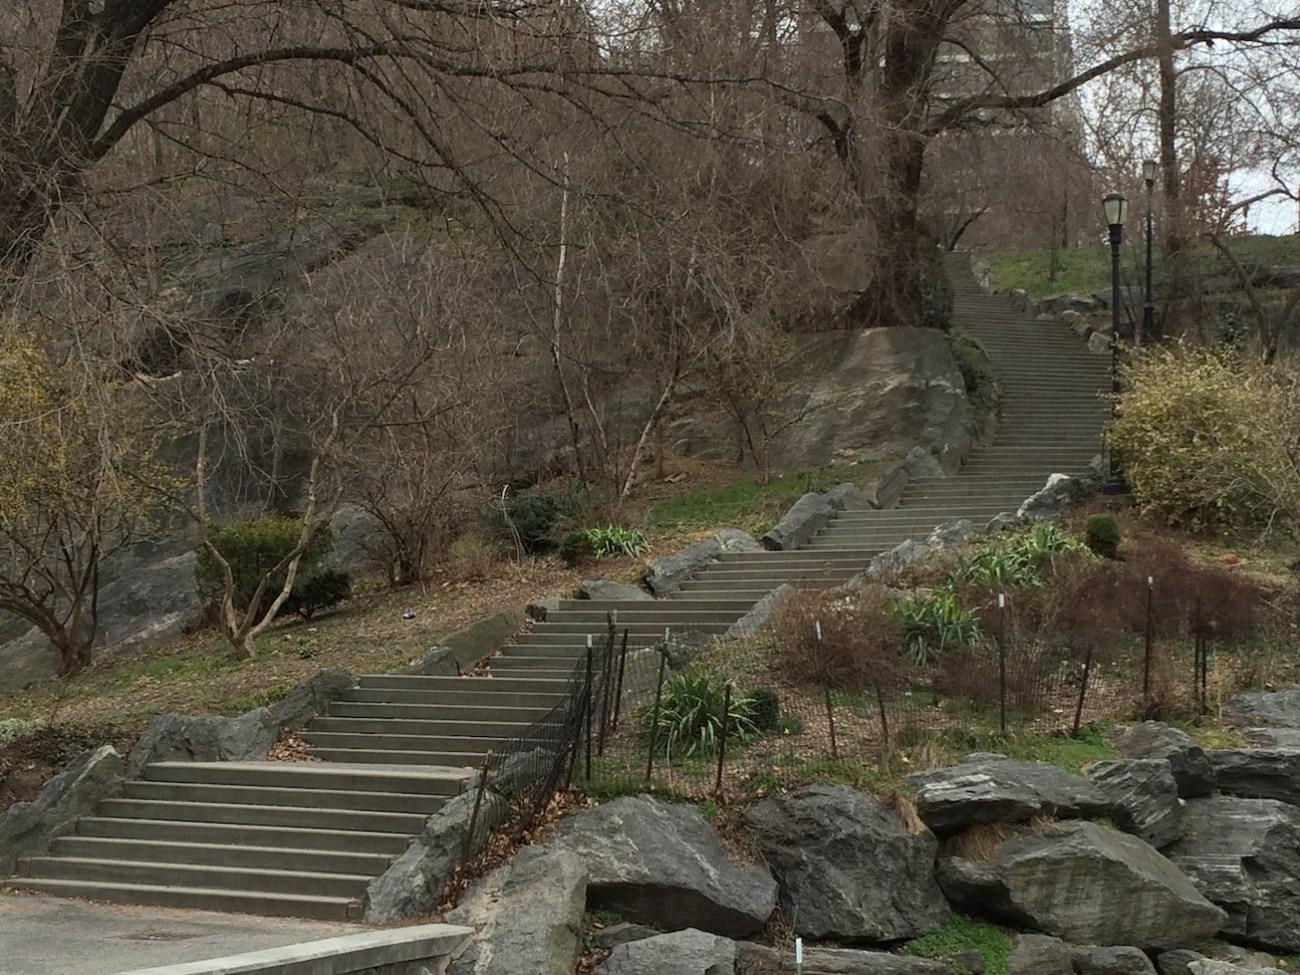 Morningside Park Stair Workout 22